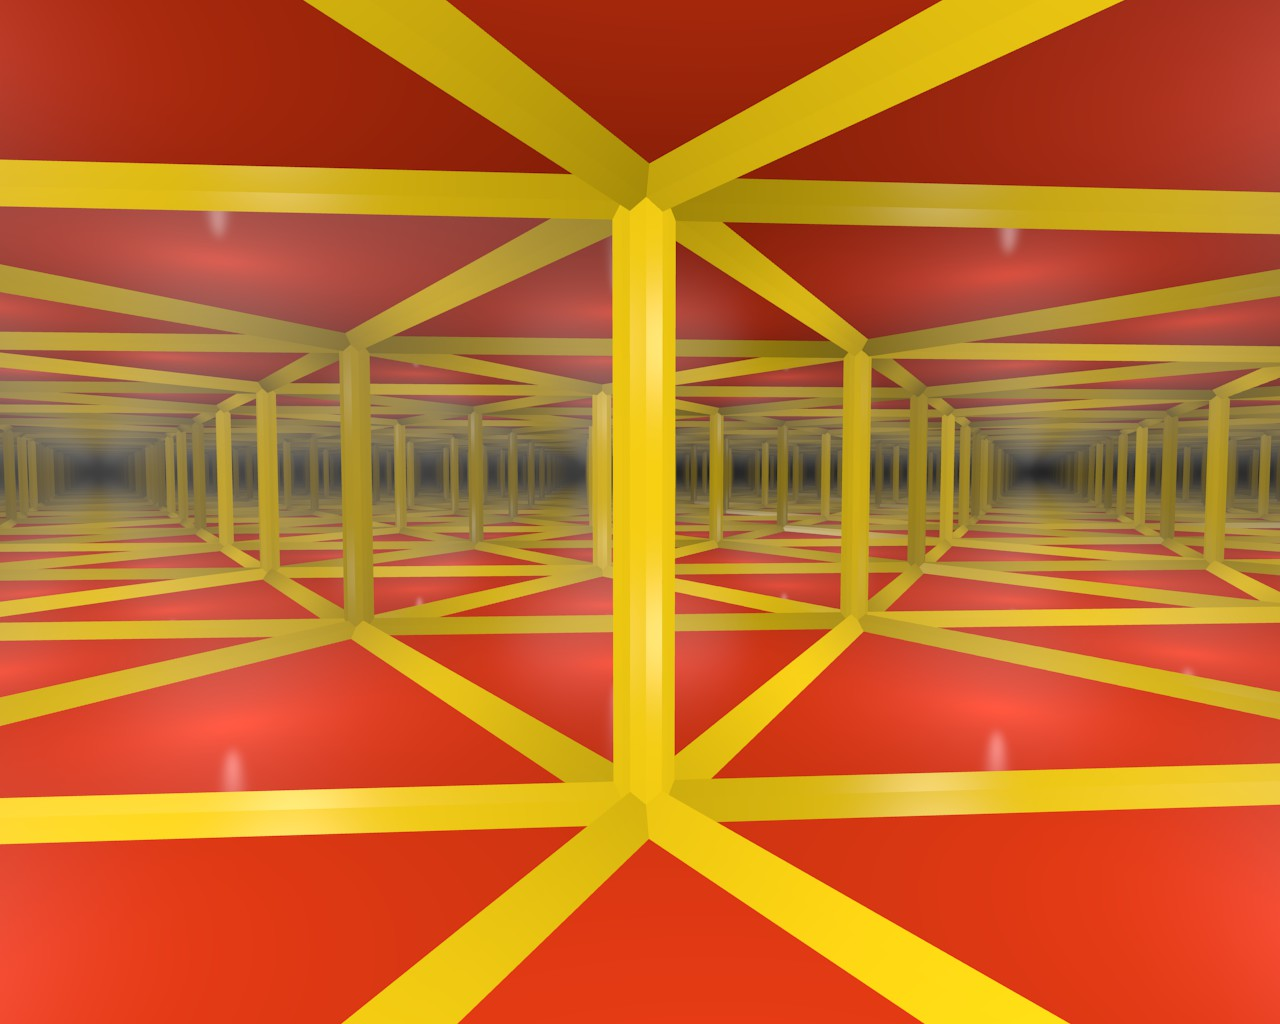 Infinity Mirror Room 41 by k45mm. Infinity Mirror Room 41 by k45mm on DeviantArt